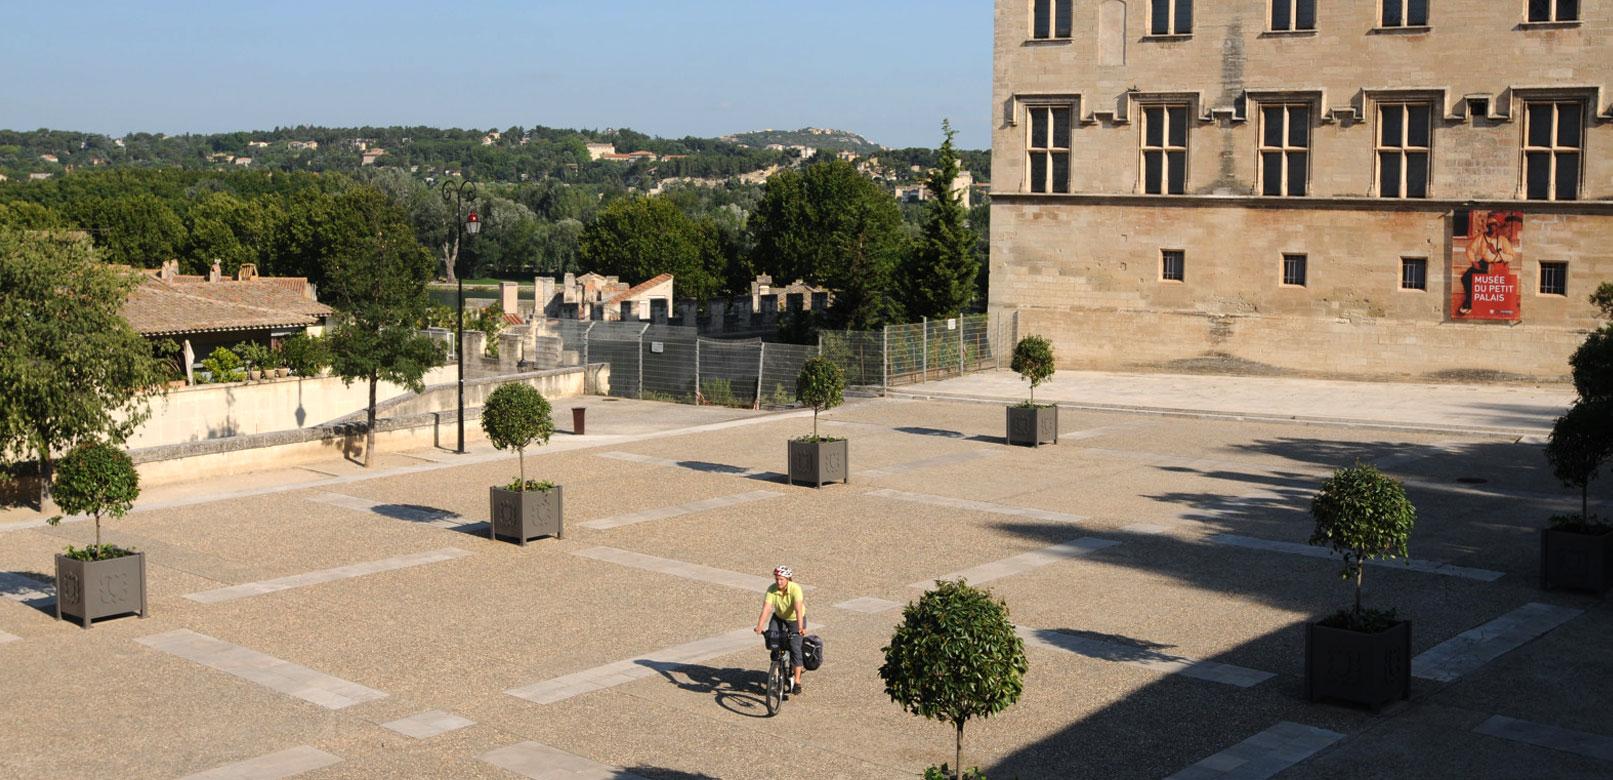 Avignon radfahren @ Brönner